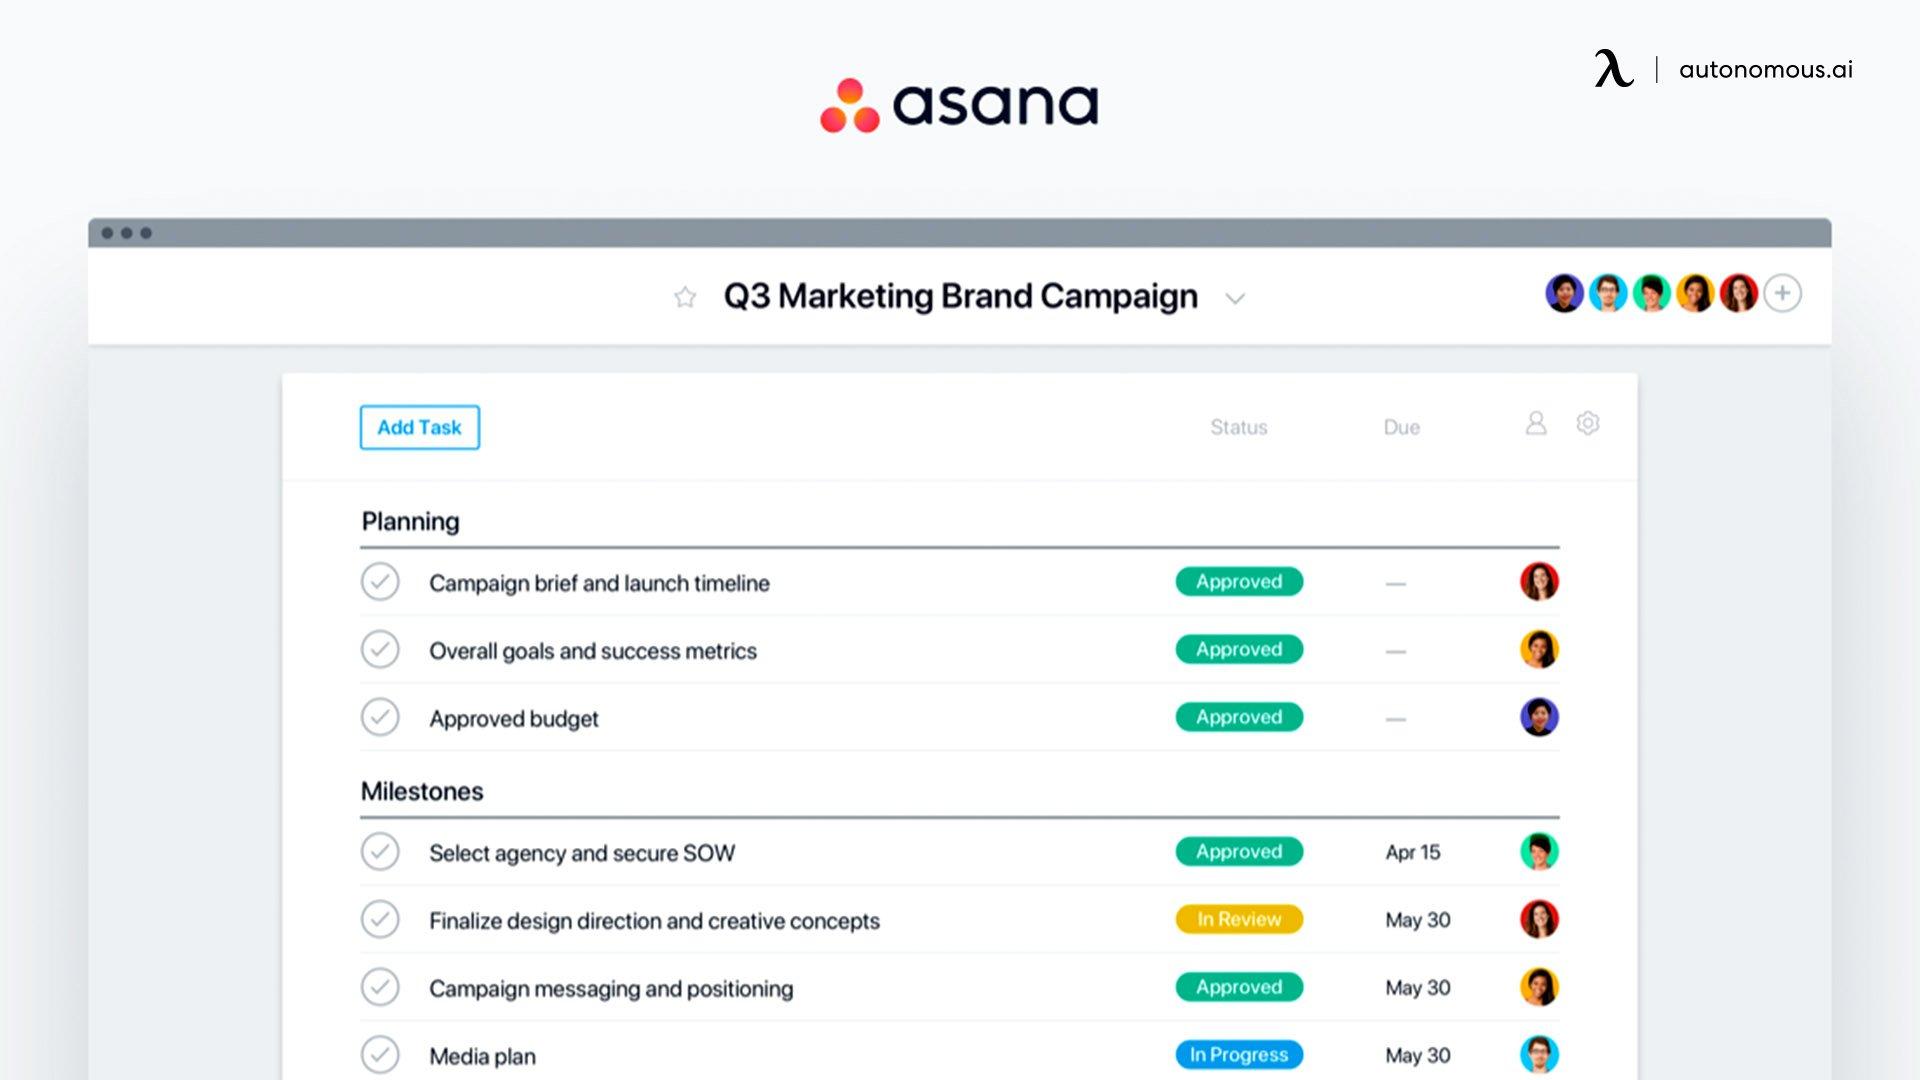 Make Use of Asana